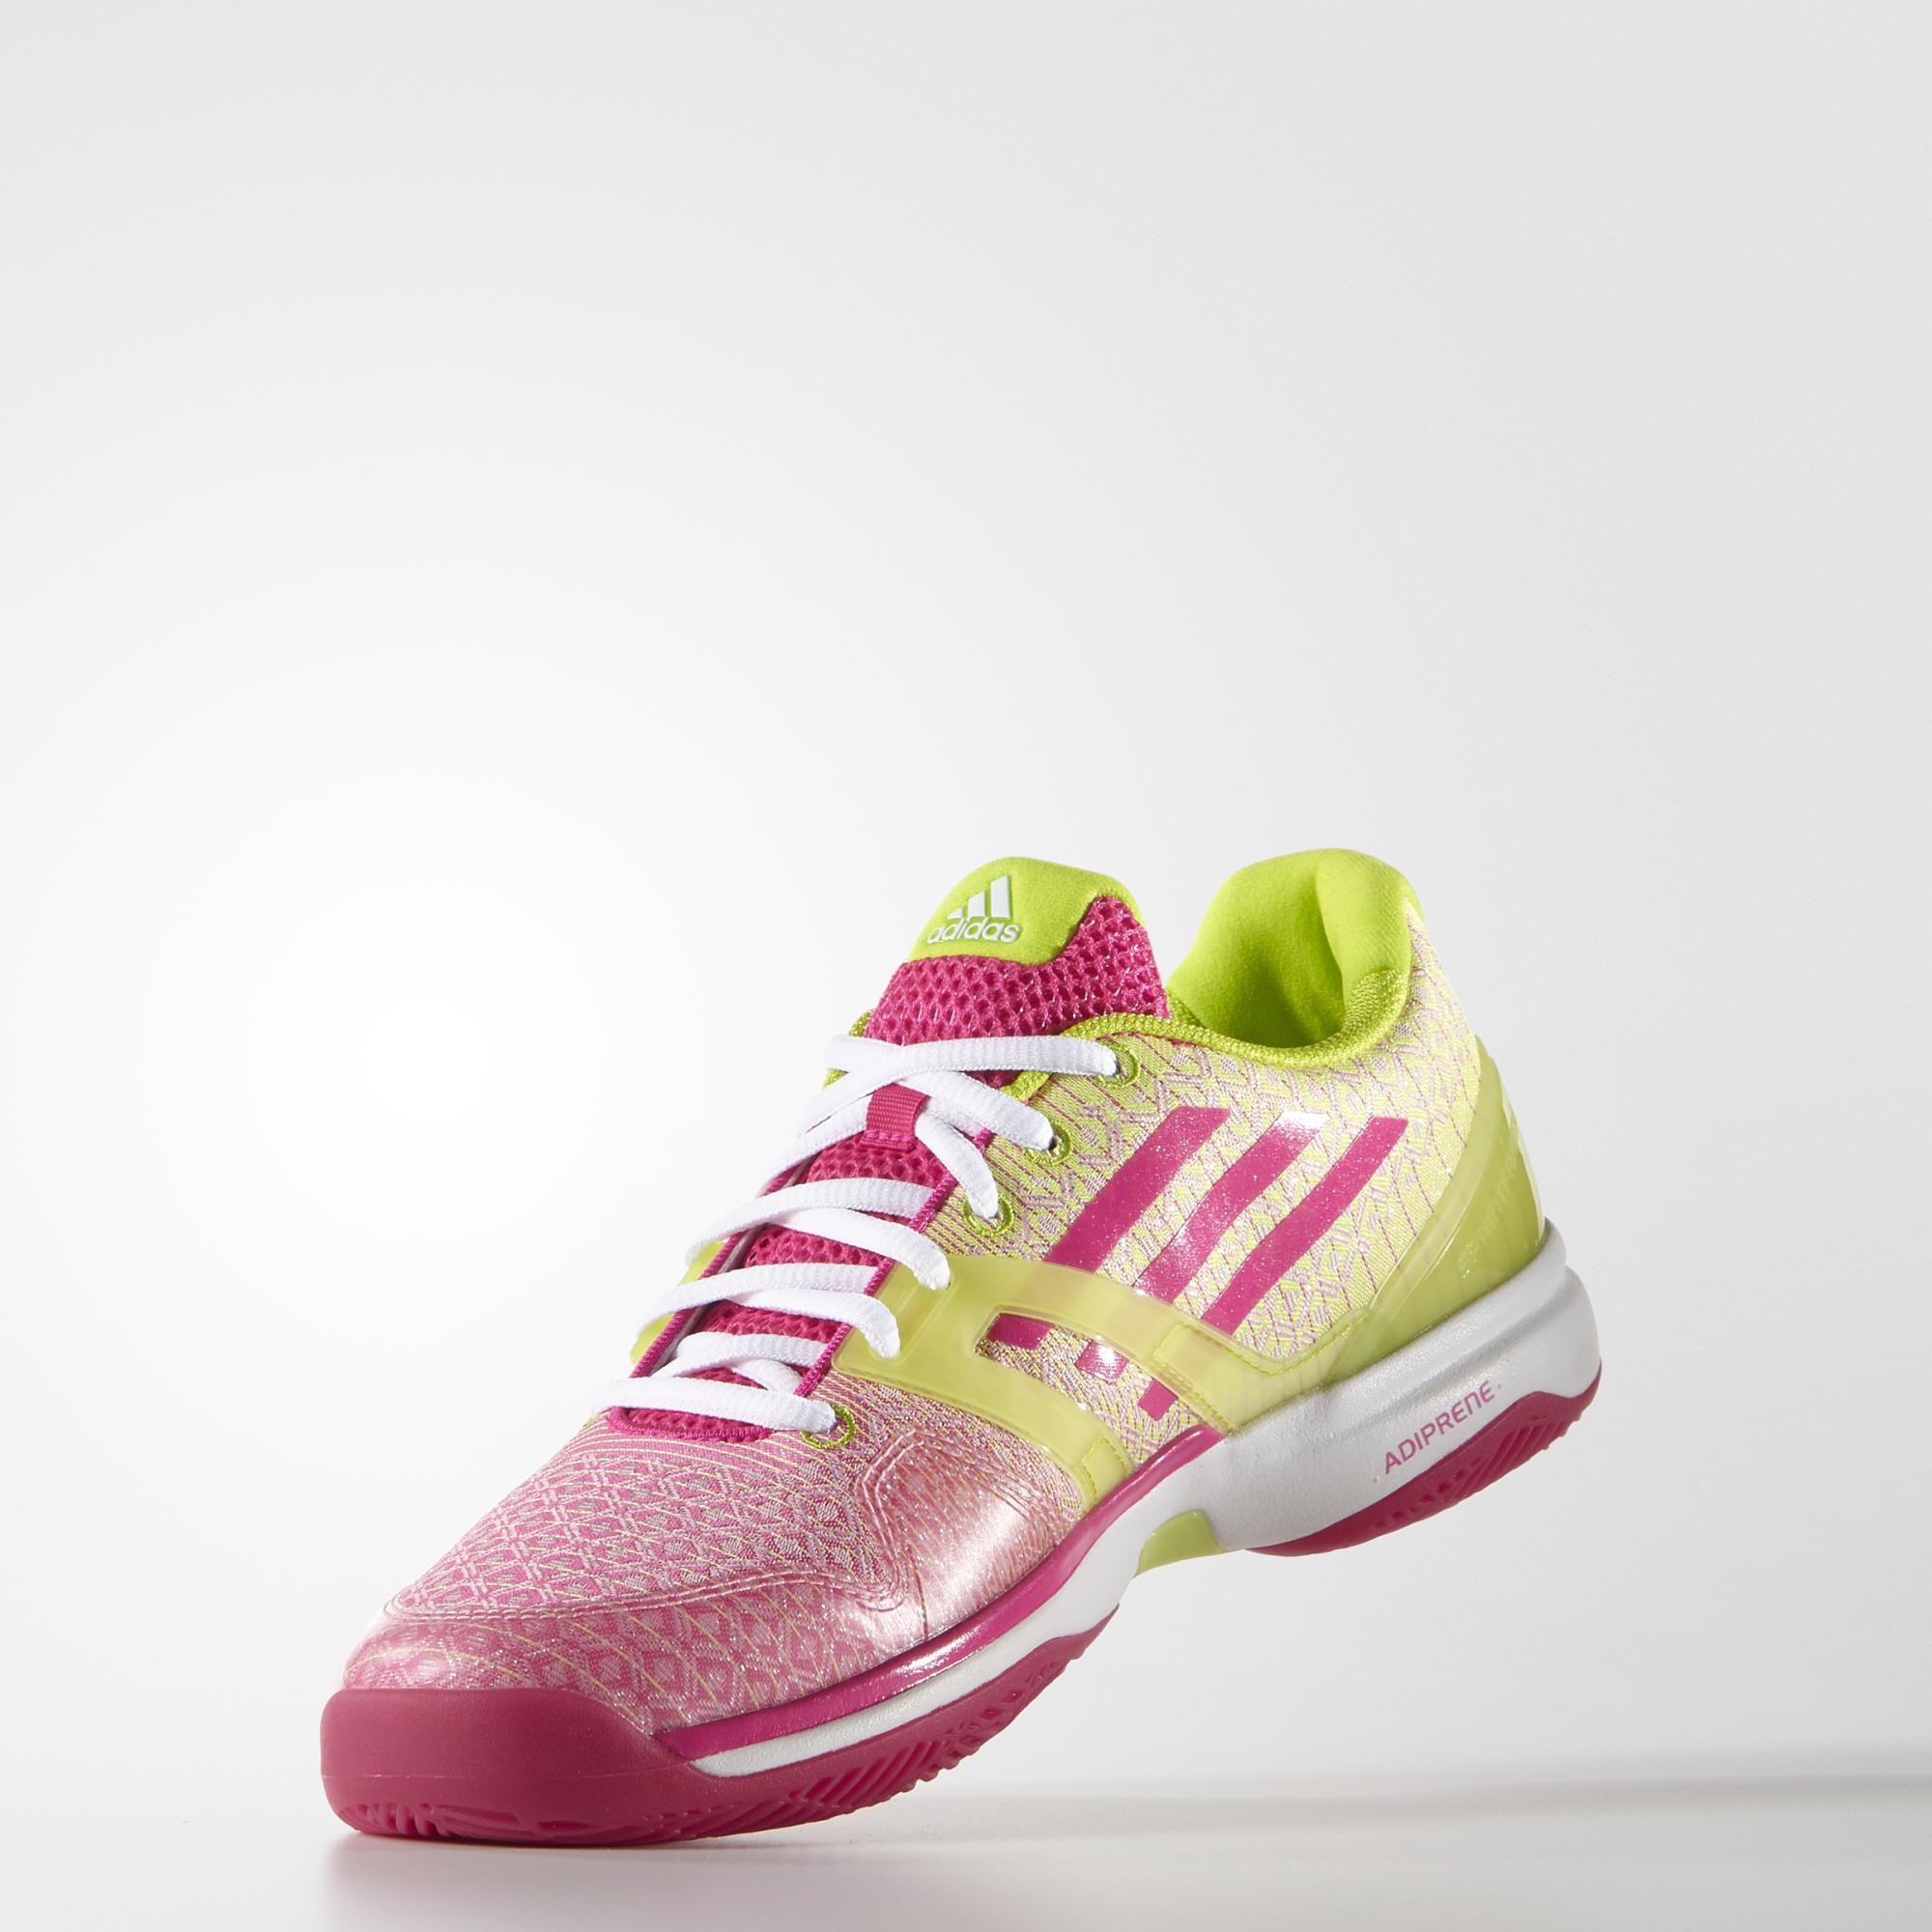 Adidas Womens Adizero Ubersonic Tennis Shoes - Green/Pink